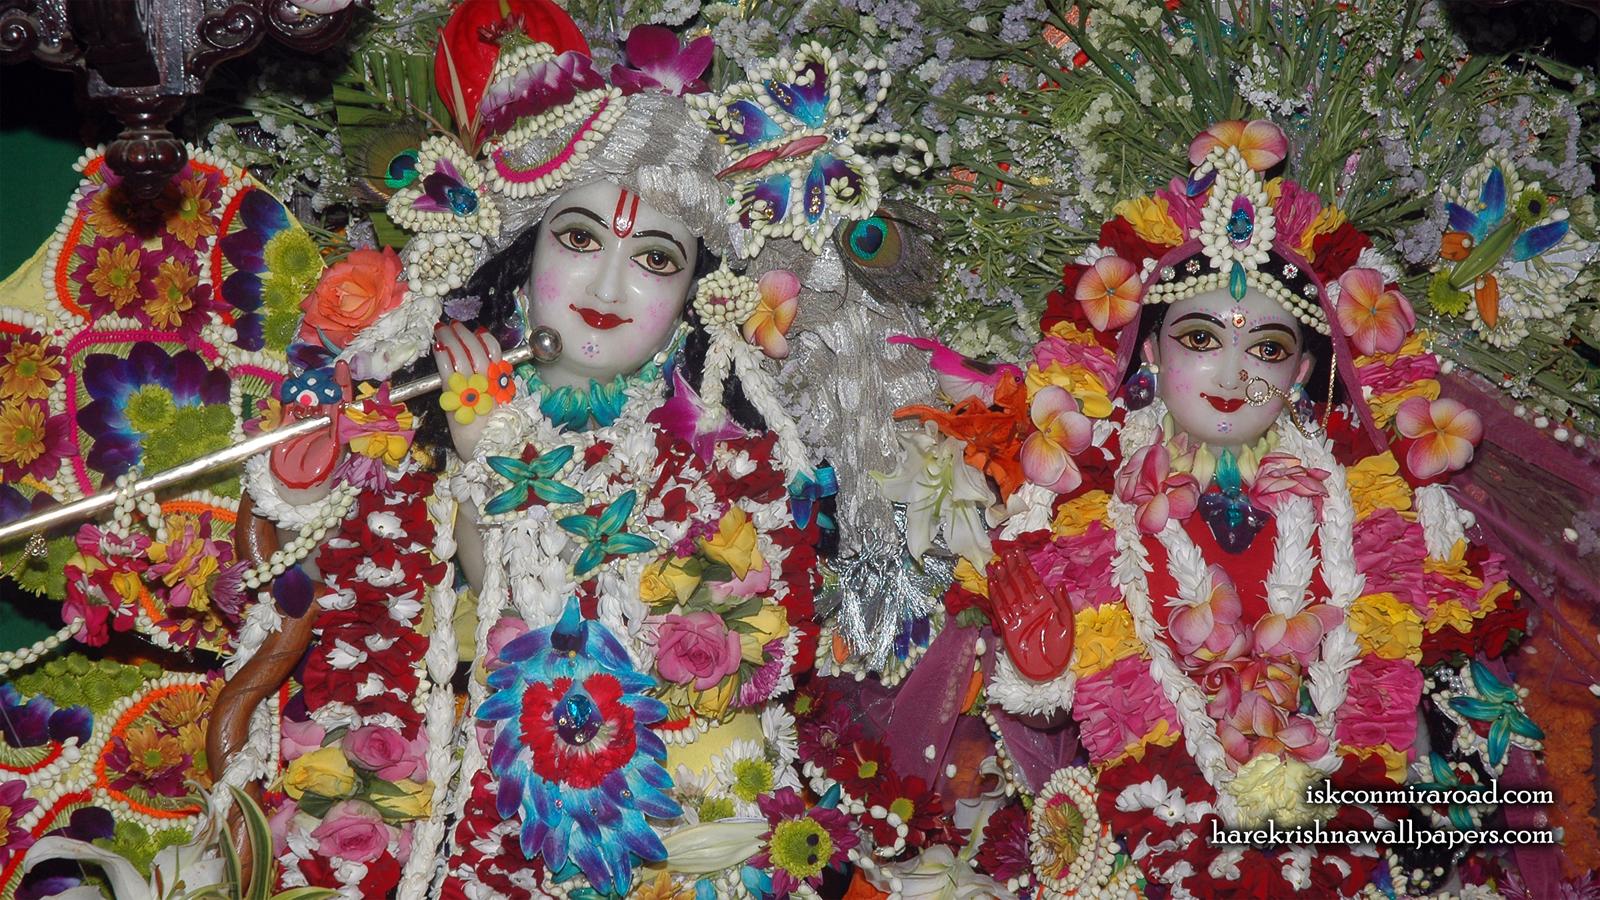 Sri Sri Radha Giridhari Close up Wallpaper (026) Size 1600x900 Download